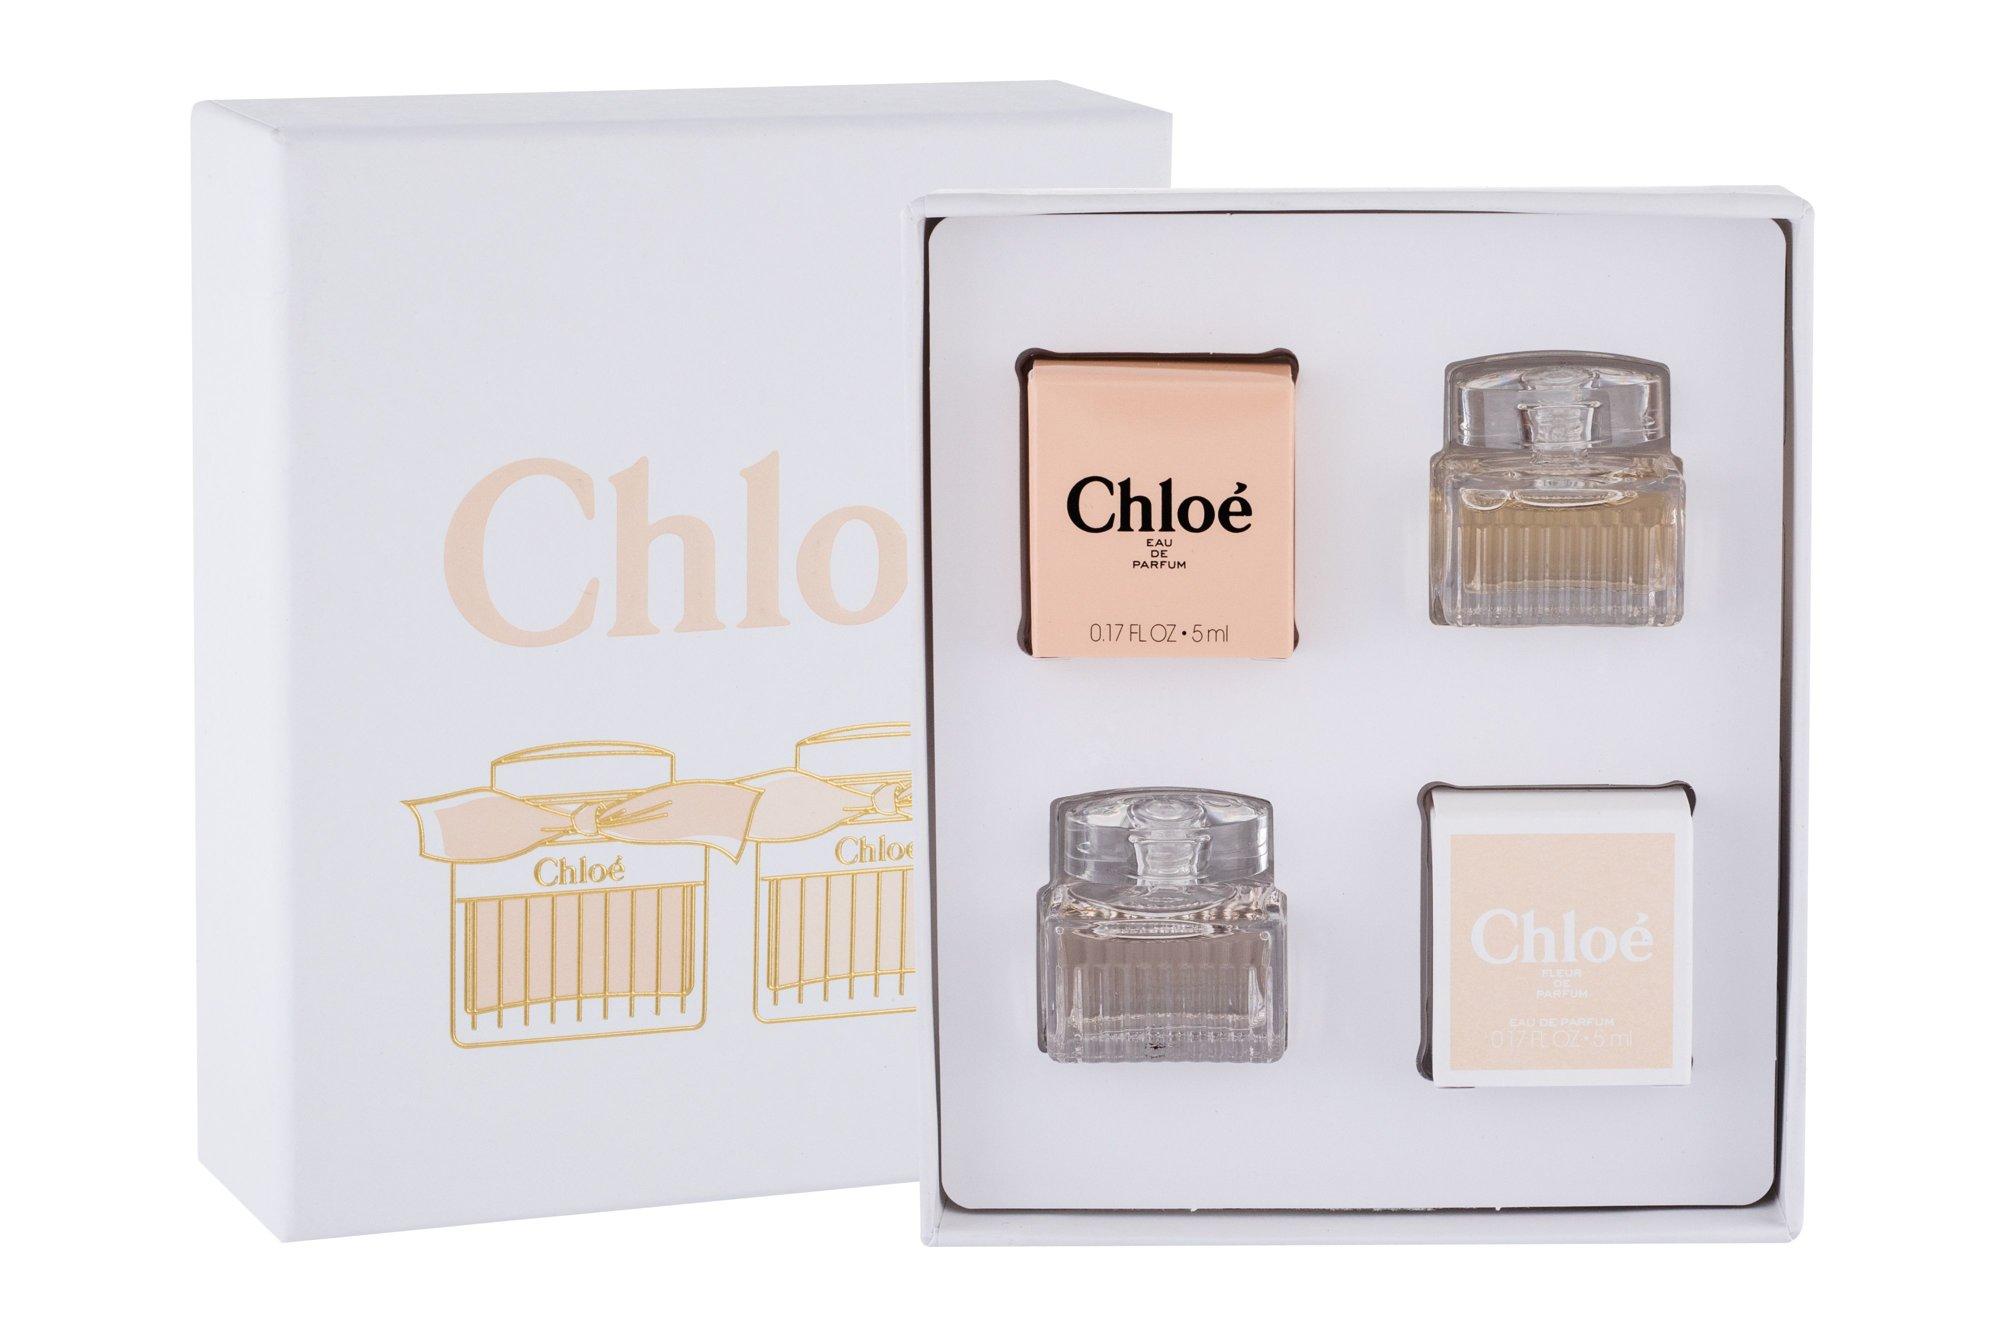 Chloe Mini Set 1 Eau de Parfum 2x5ml